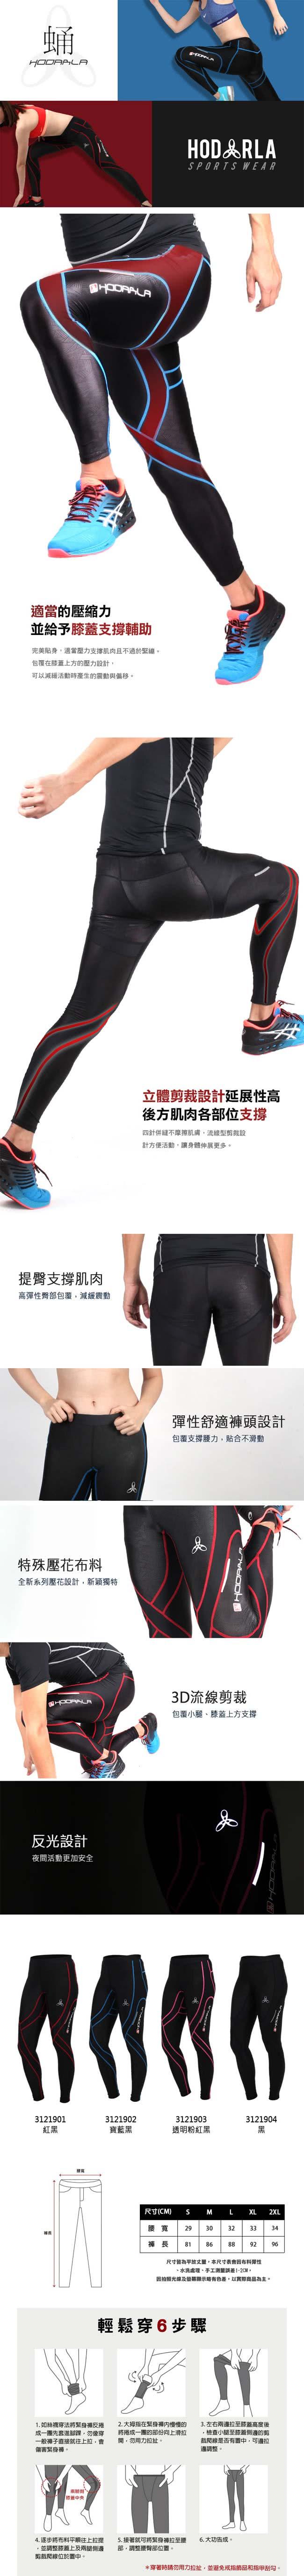 【HODARLA】蛹男女壓縮緊身長褲-慢跑 路跑 內搭褲 緊身褲 束褲(透明粉紅黑)